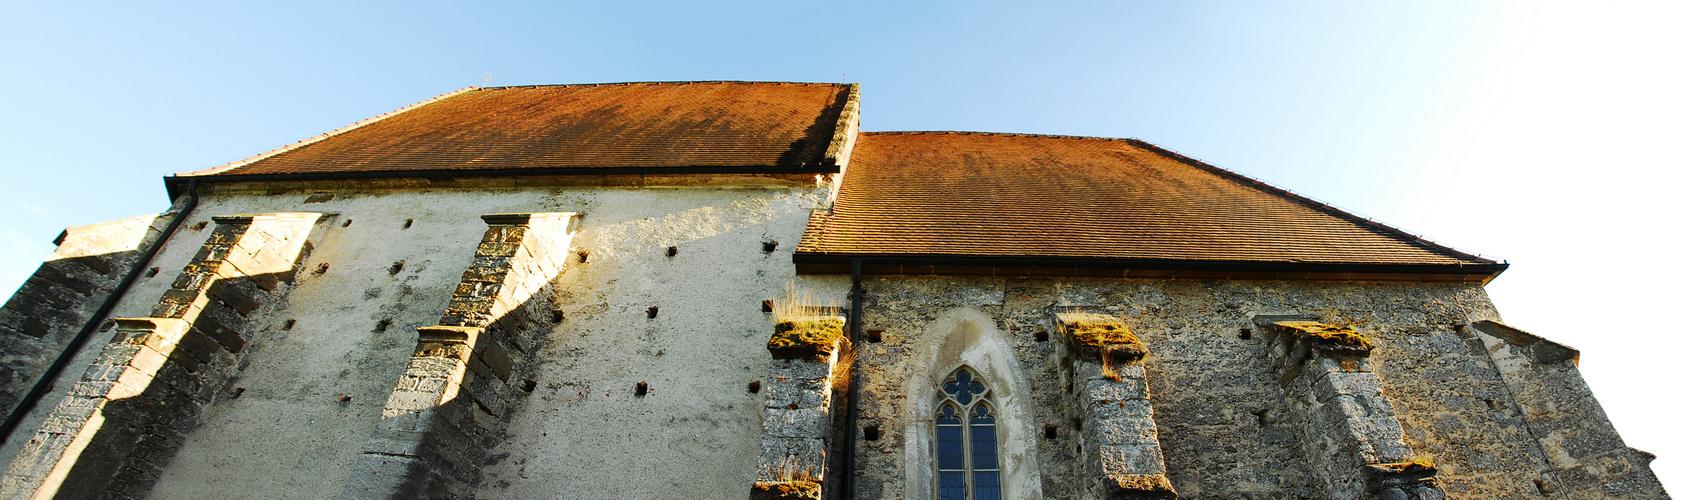 Kirche Kanning SideView